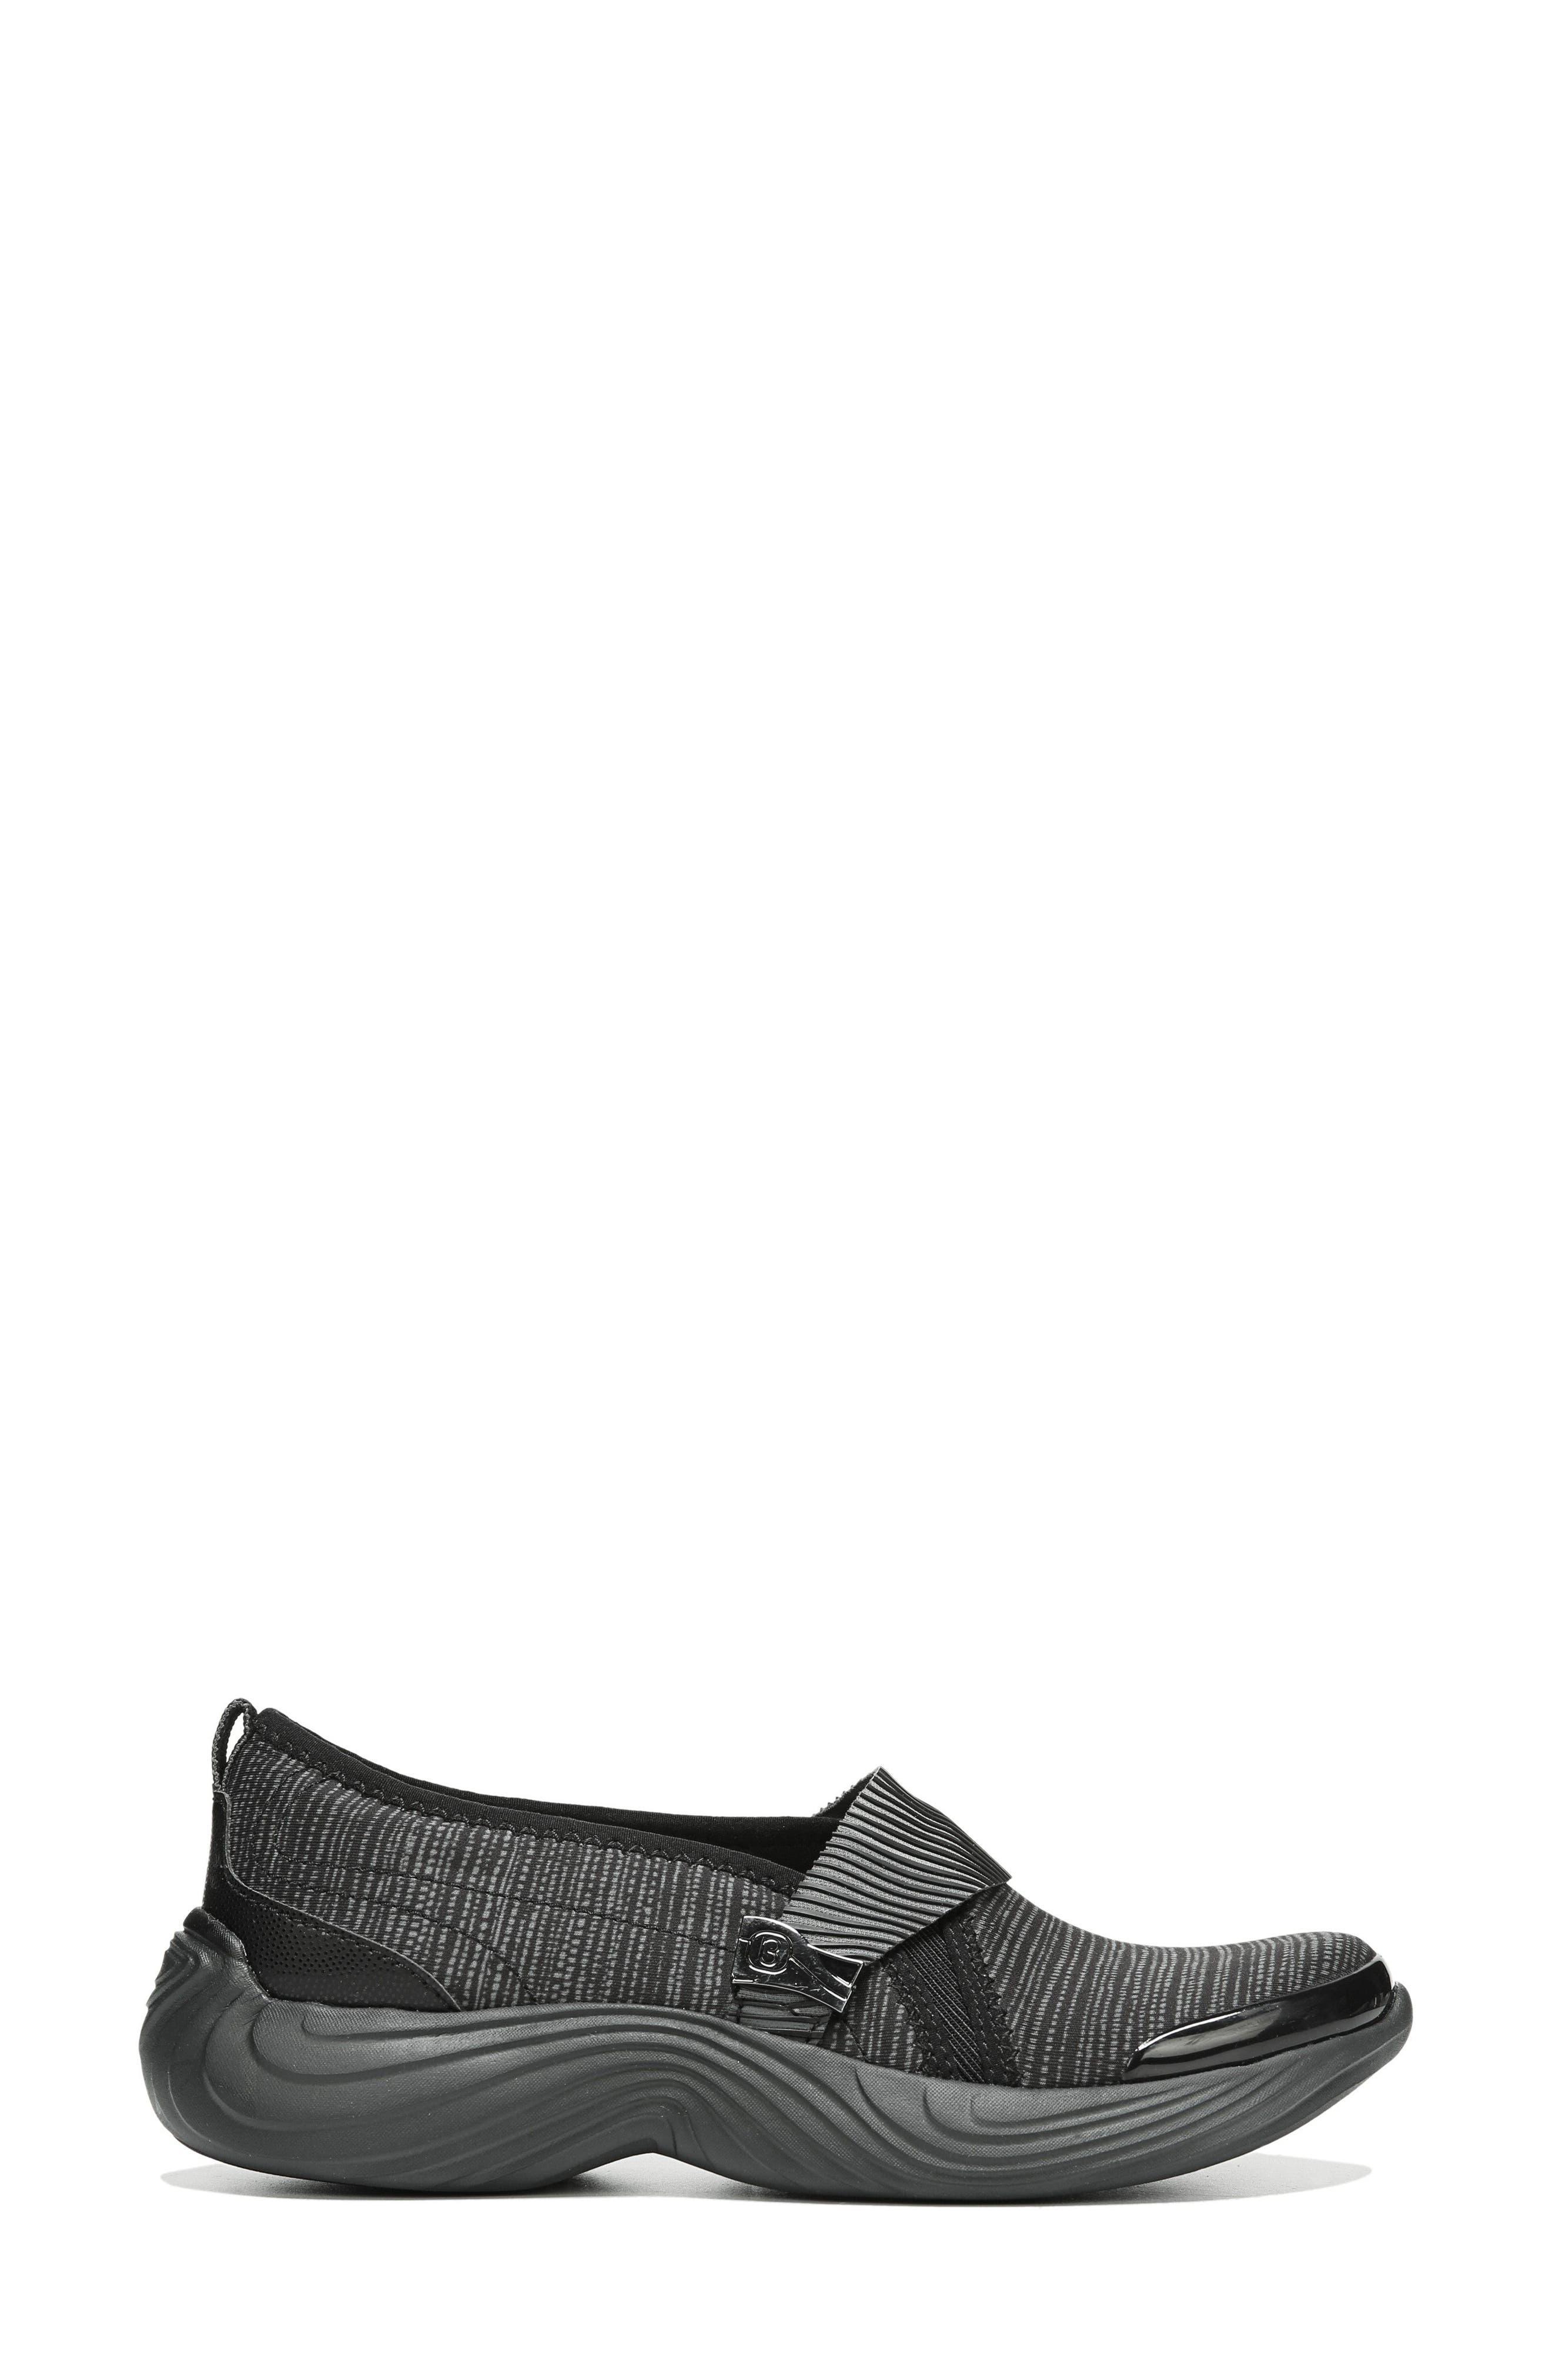 Tanza Slip-On,                             Alternate thumbnail 3, color,                             Black Fabric